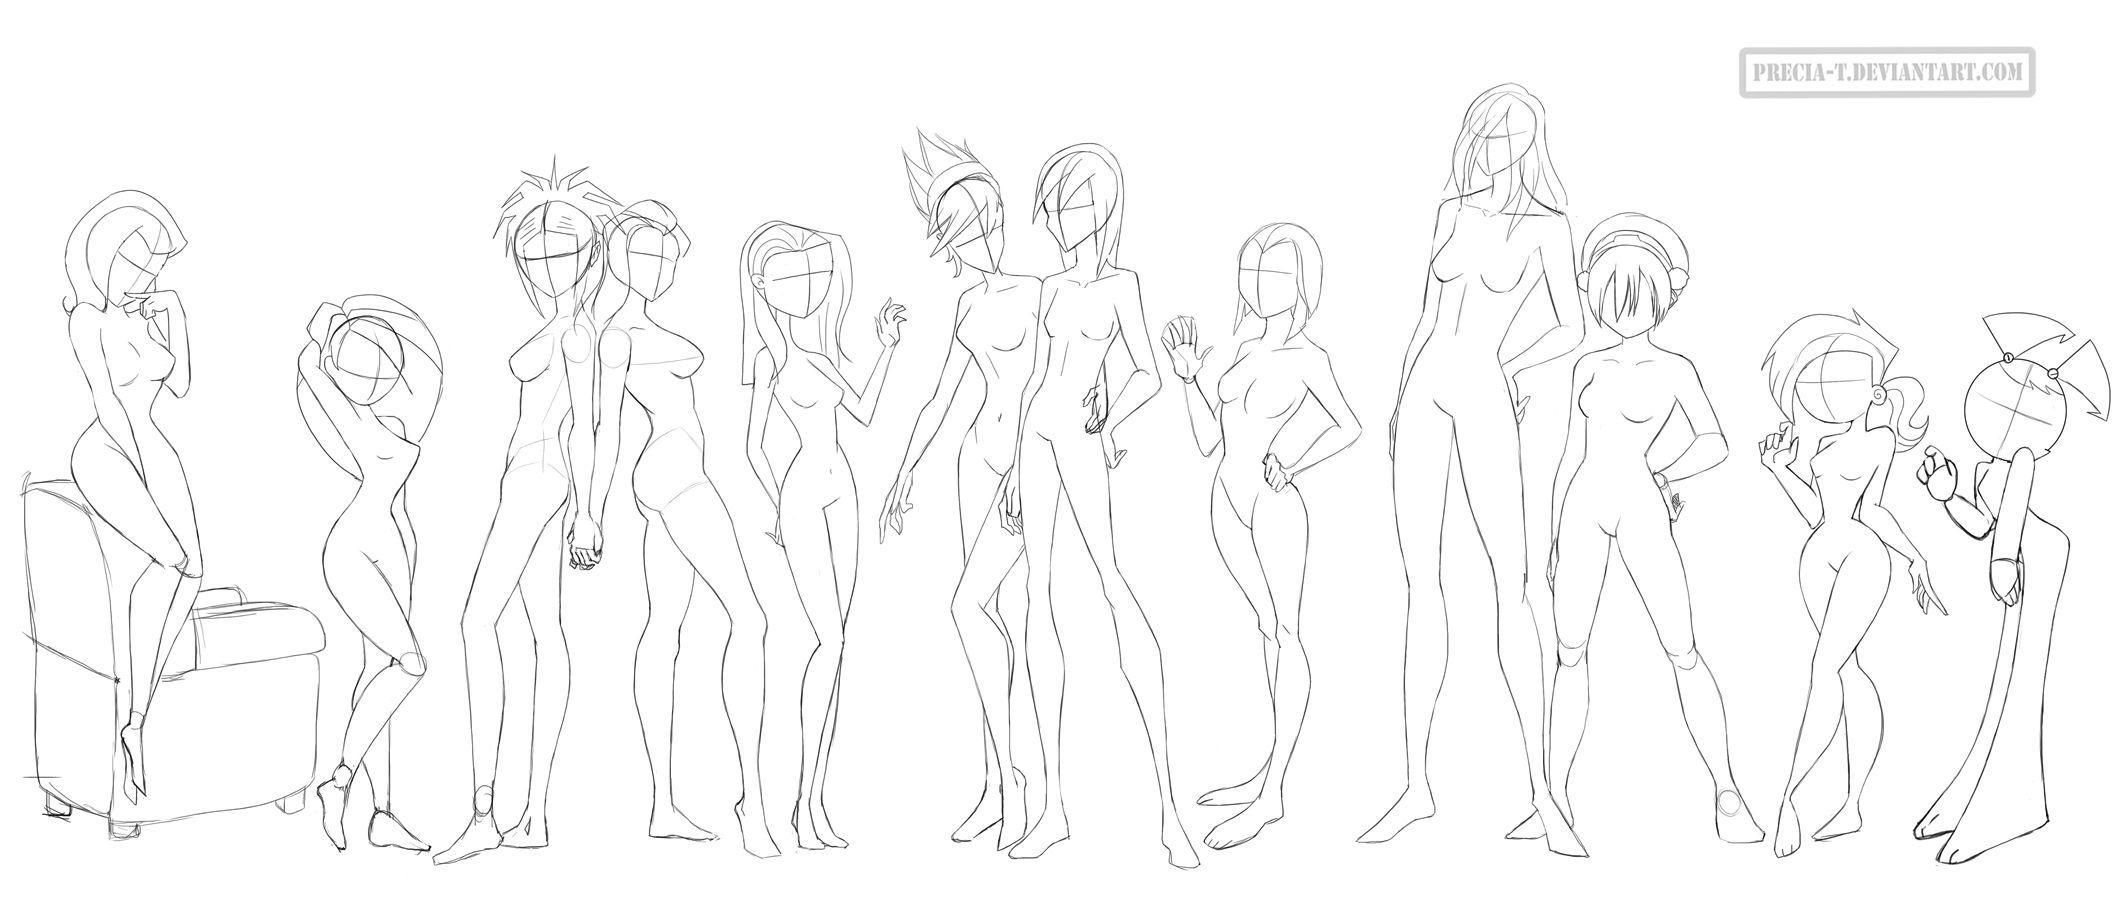 Female anatomy (cartoonish) by Precia-T.deviantart.com on ...